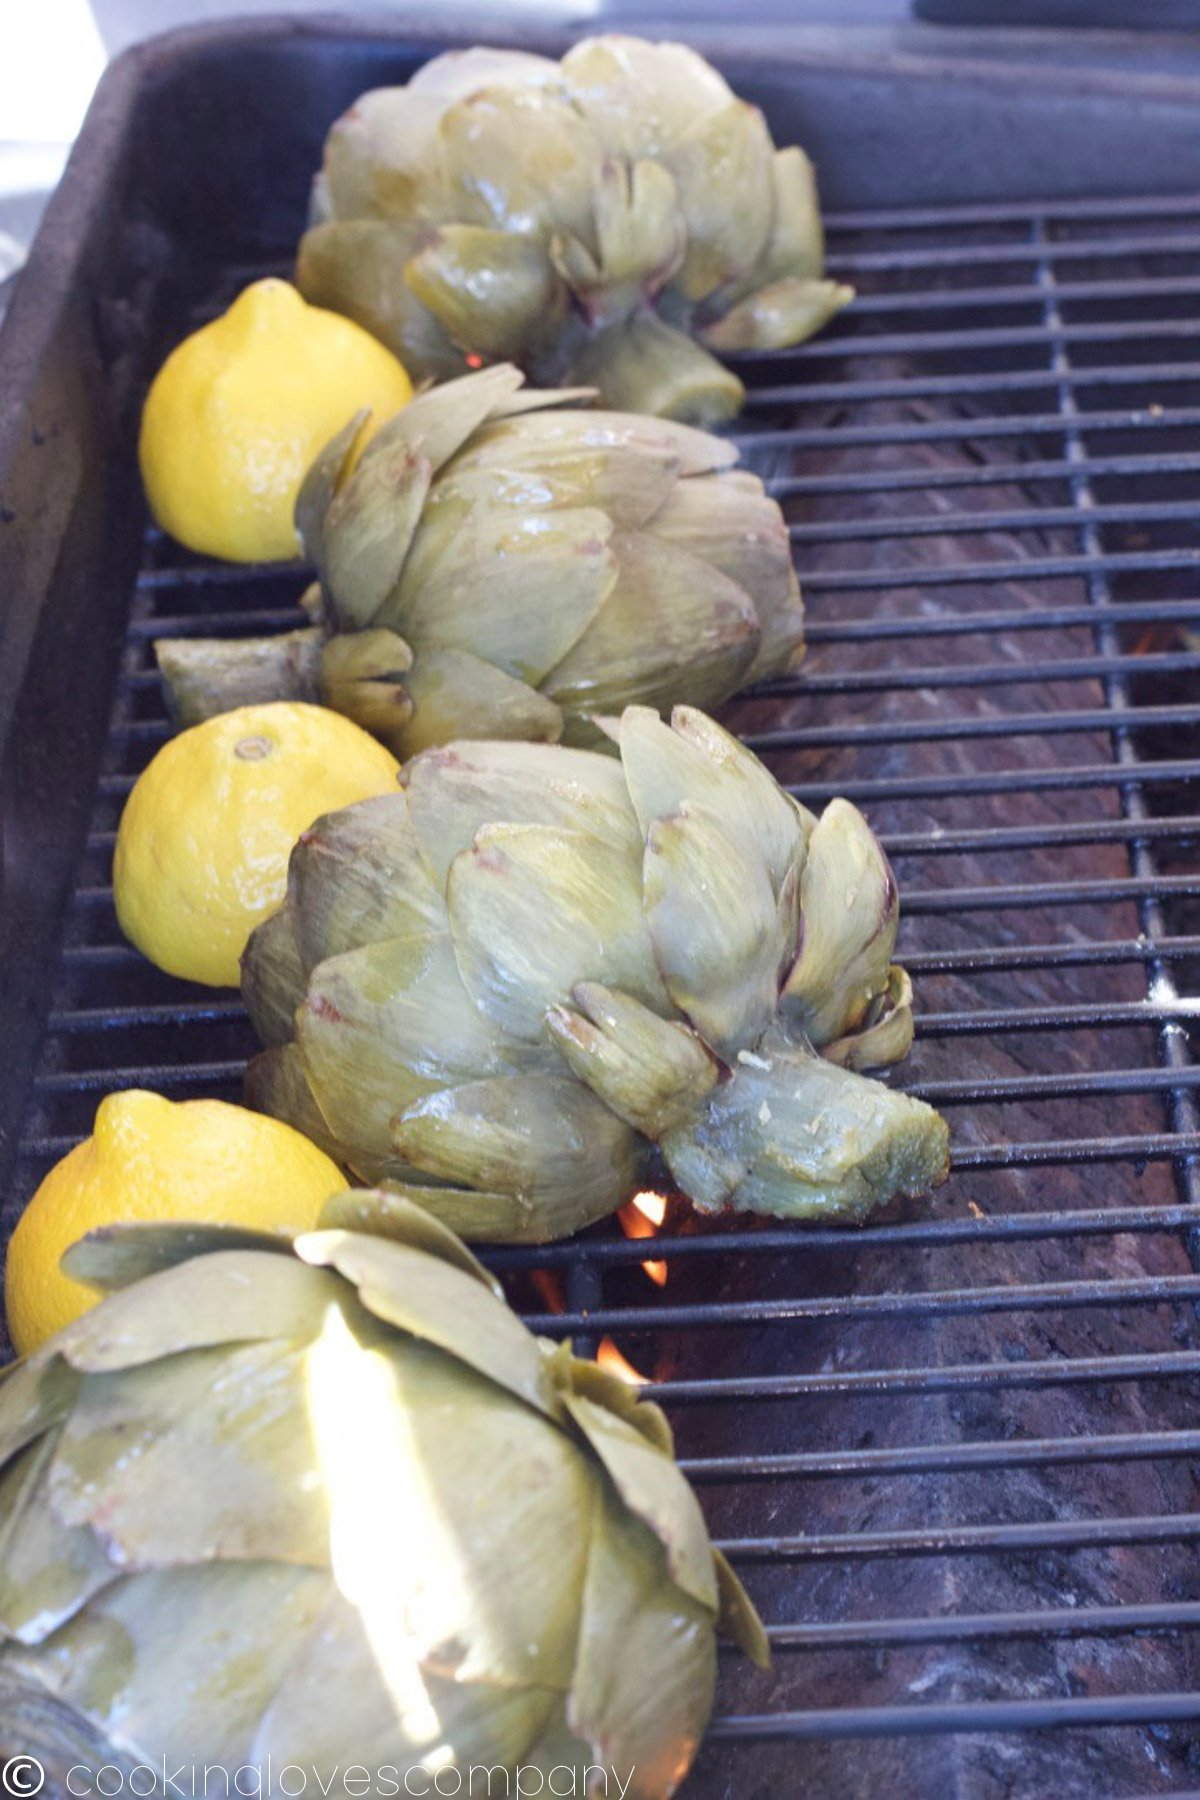 Four artichoke and lemon halves cut side down on a grill